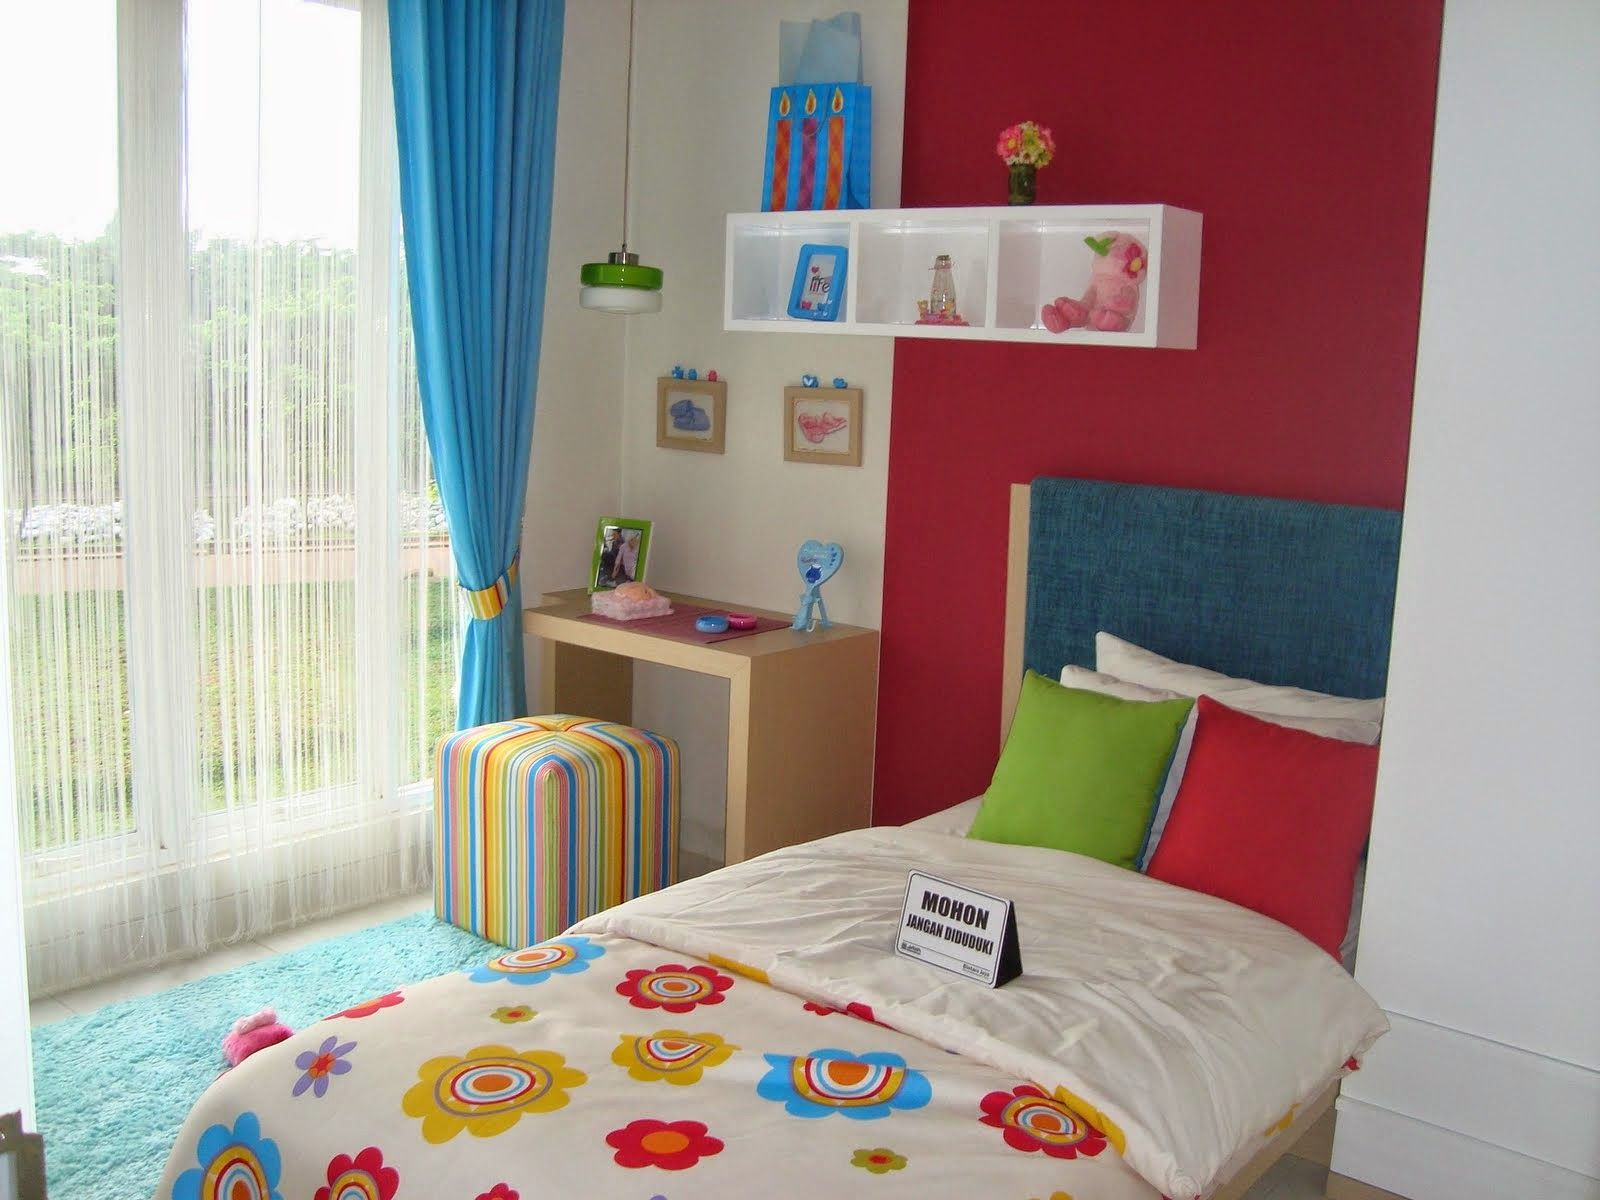 tips desain interior kamar tidur ukuran 2x2 meter minimalis | kamar